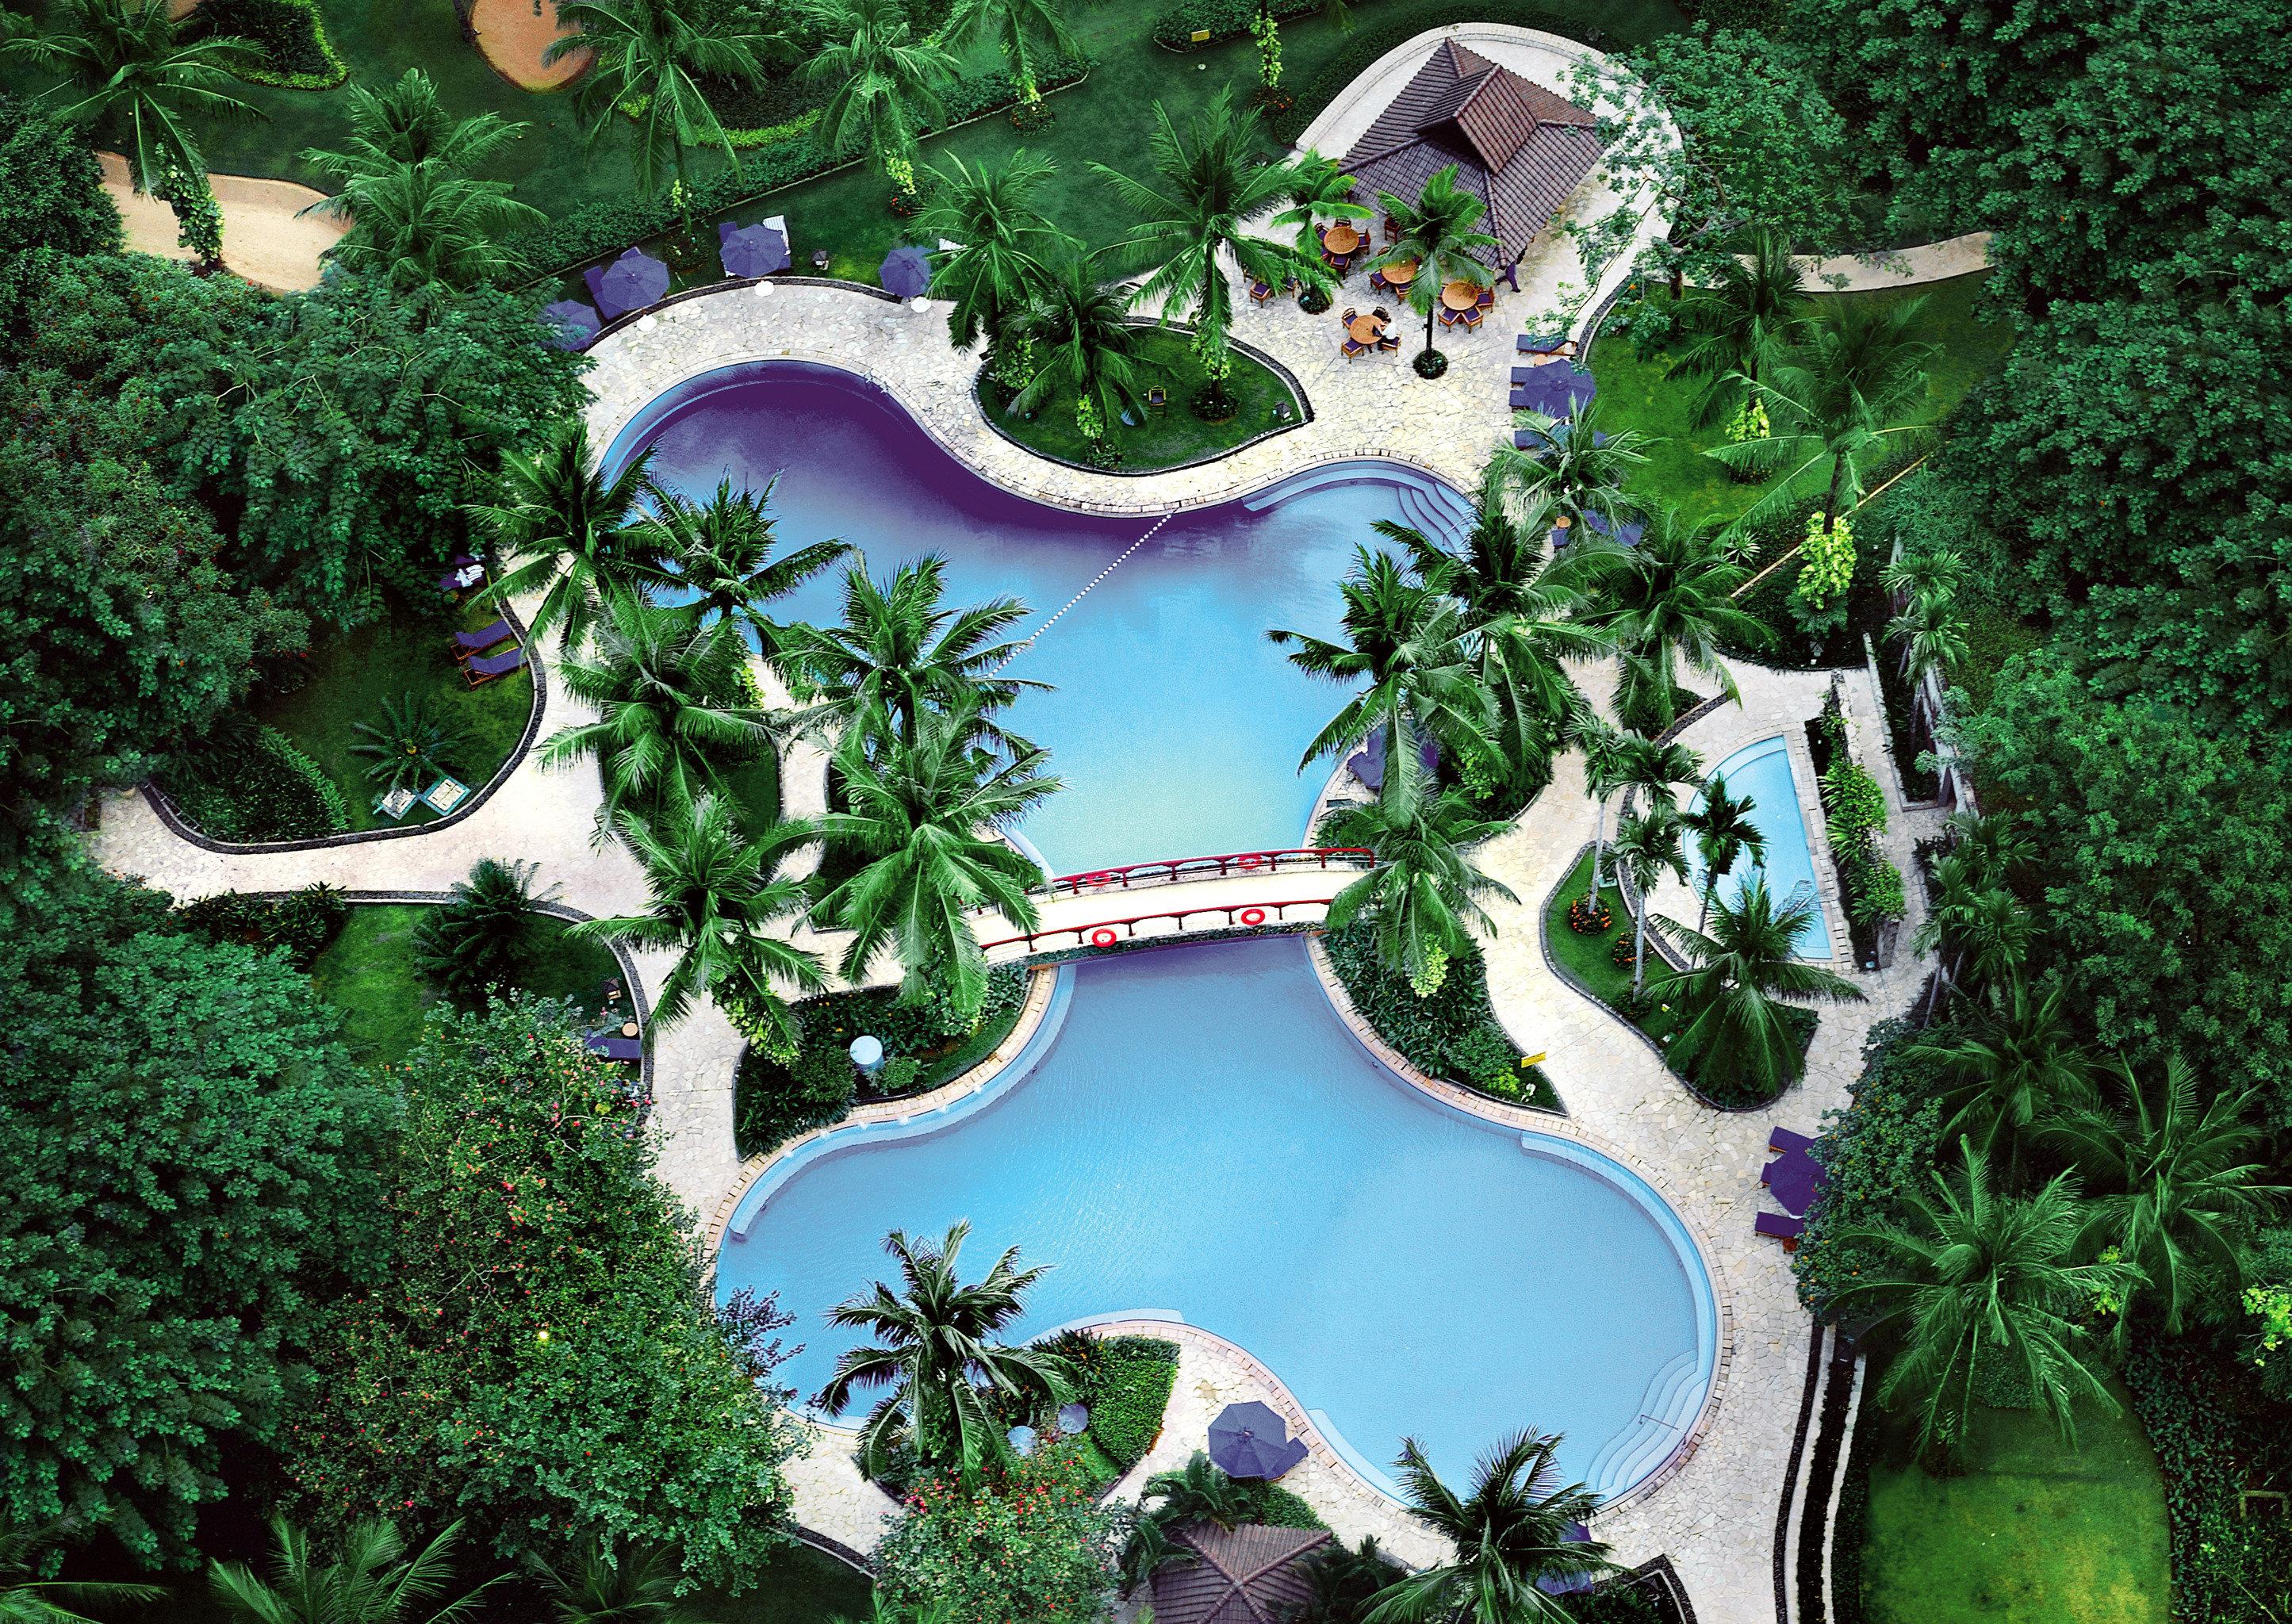 All-inclusive Hot tub/Jacuzzi Luxury Pool tree text plant ecosystem botany Garden mansion Resort Jungle screenshot backyard park amusement park biome surrounded